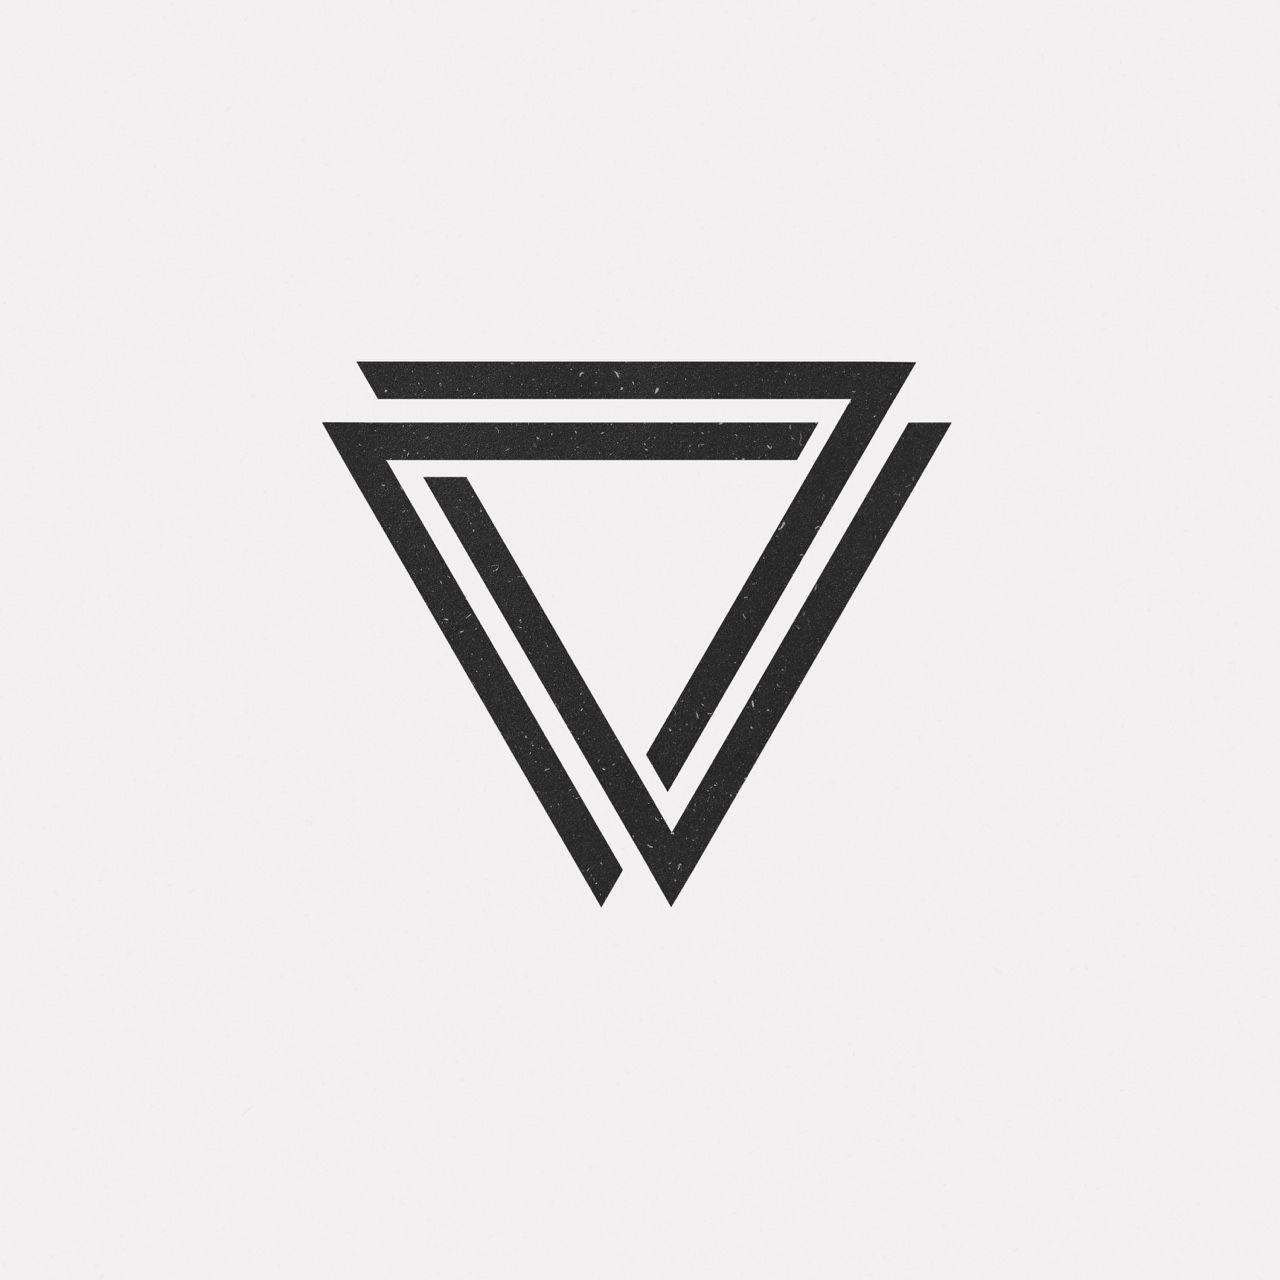 Ja16 444 A New Geometric Design Every Day Logo Inspiration Tatto